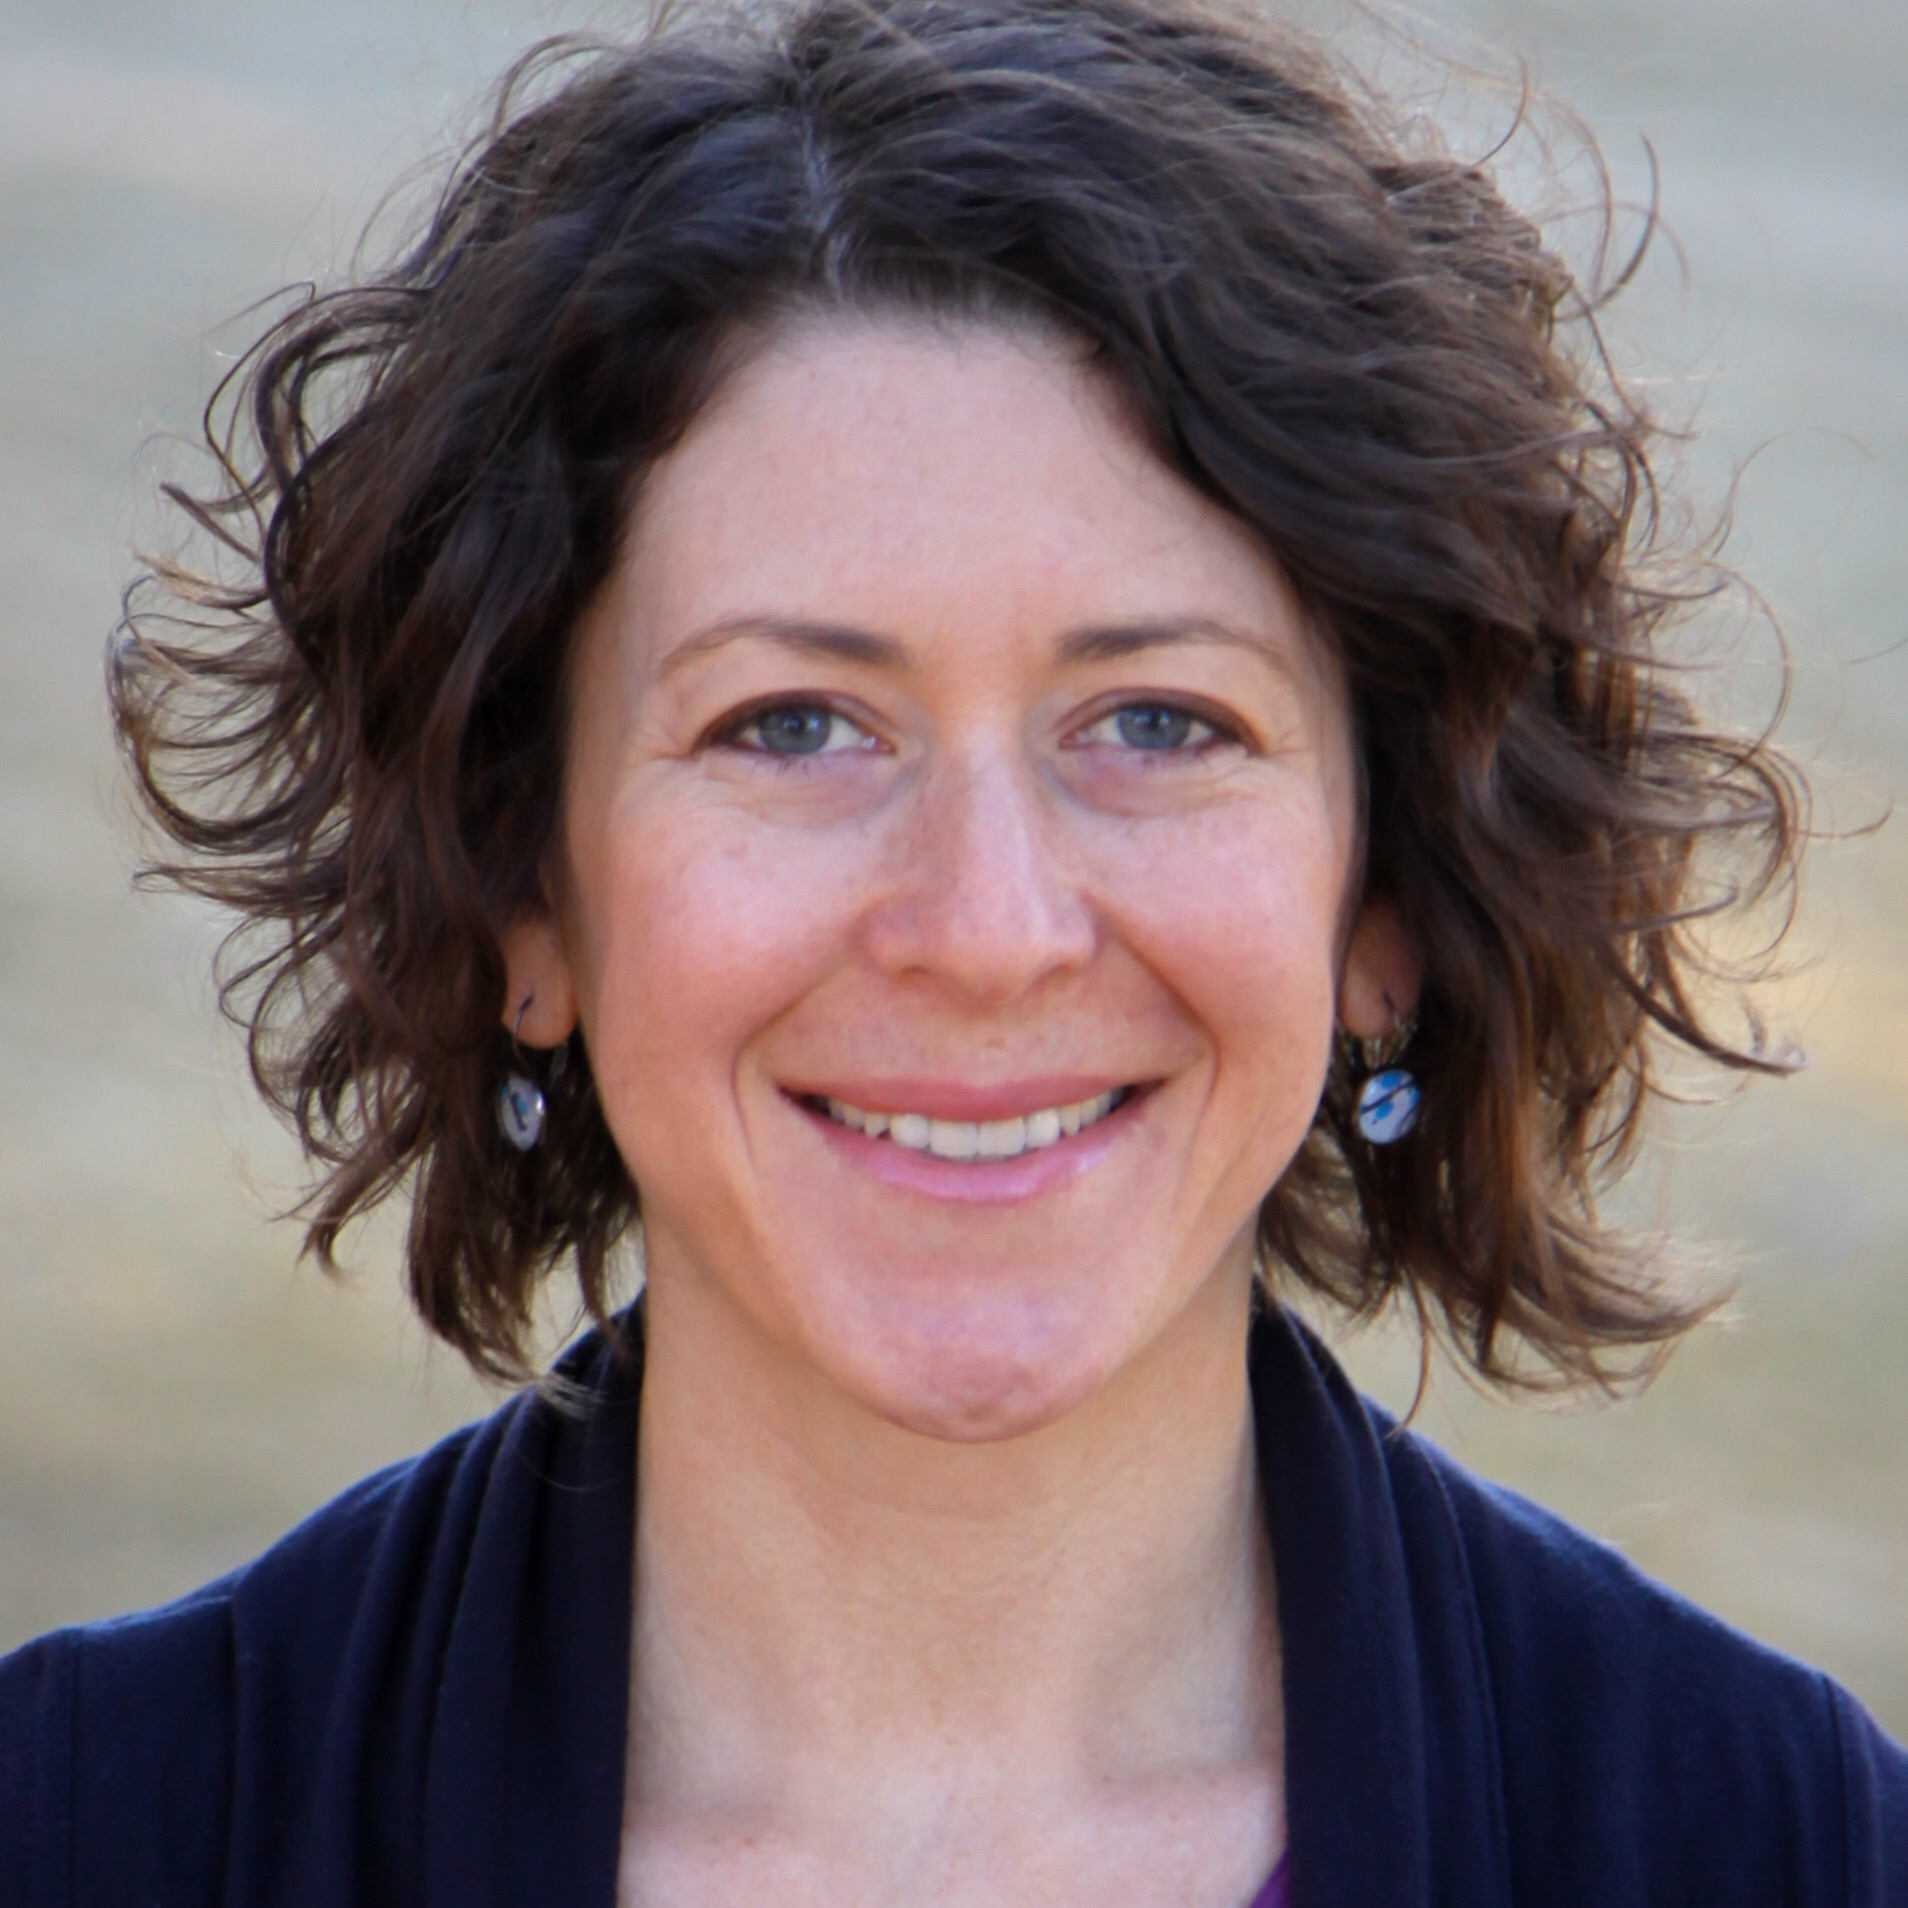 CO Representative Emily Sirota